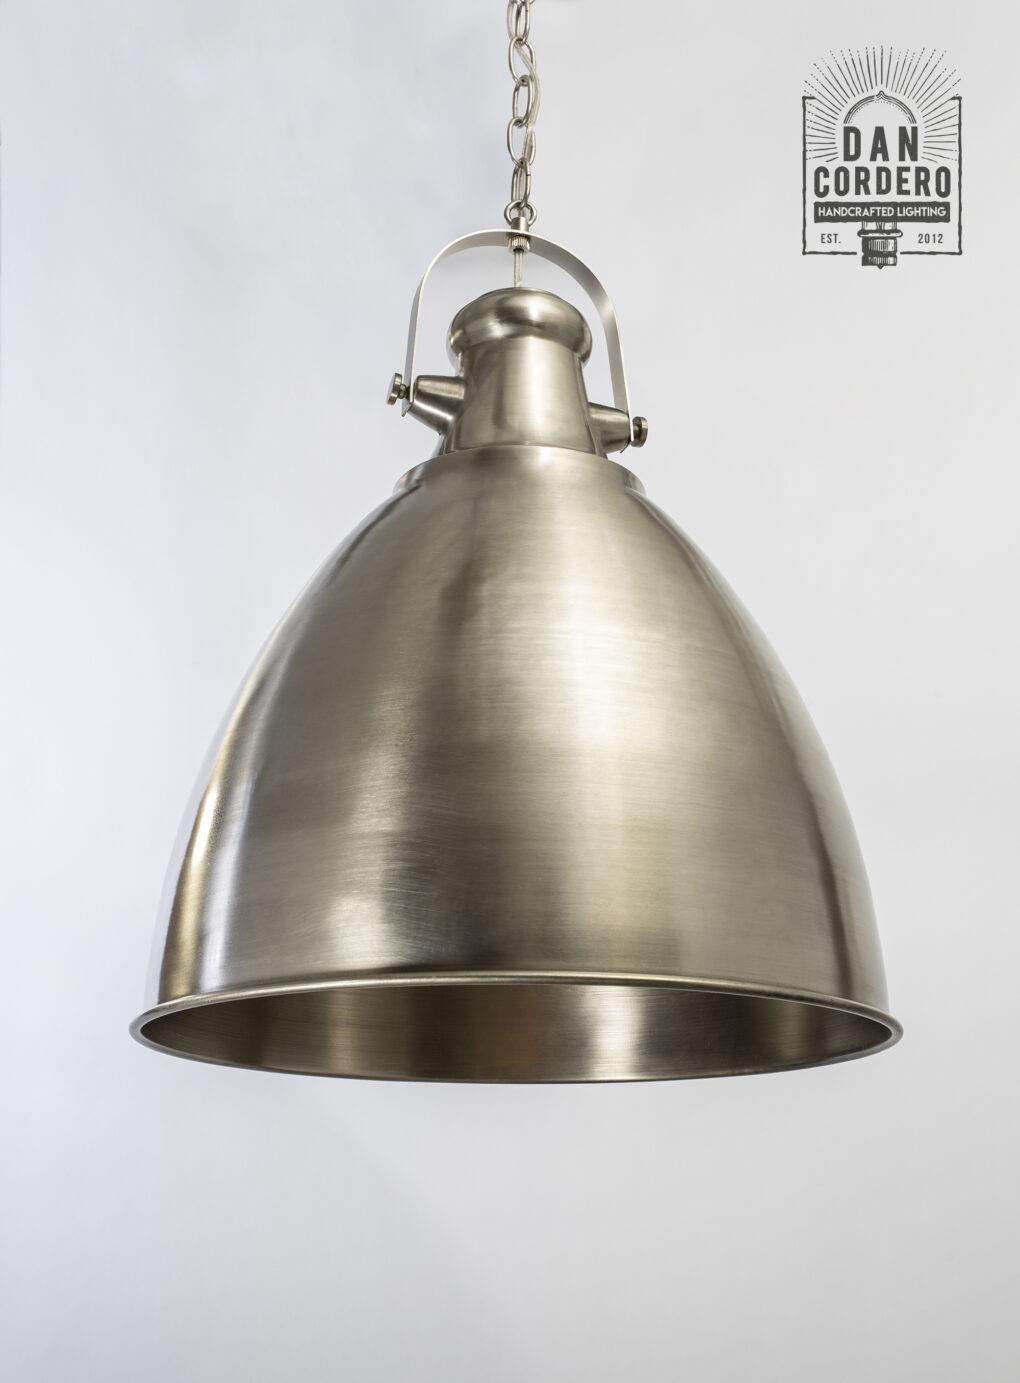 Oversized Dome Light Fixture